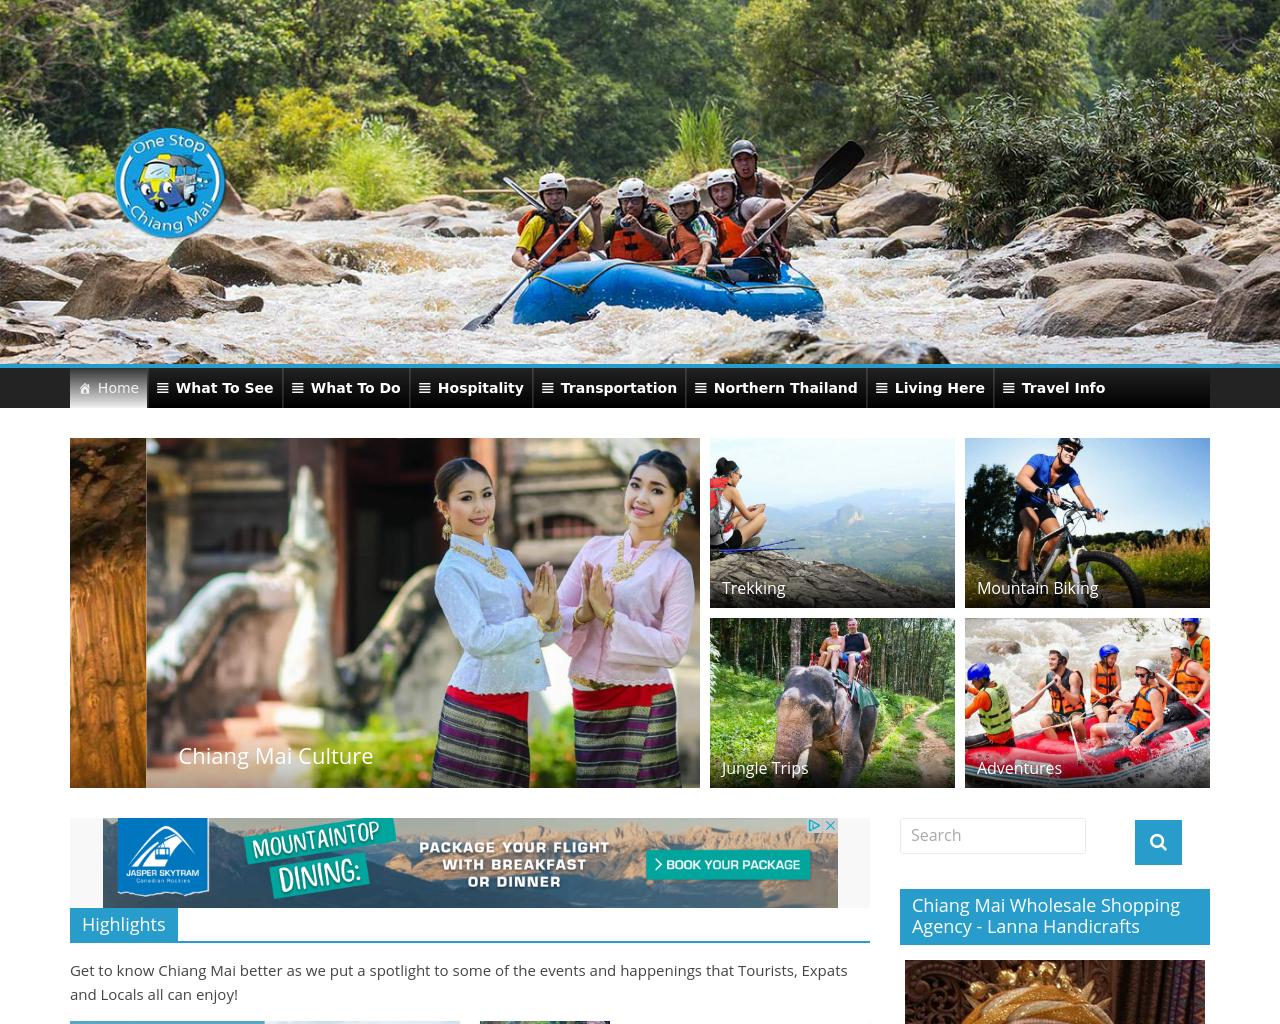 1stop-Chiang-Mai-Advertising-Reviews-Pricing